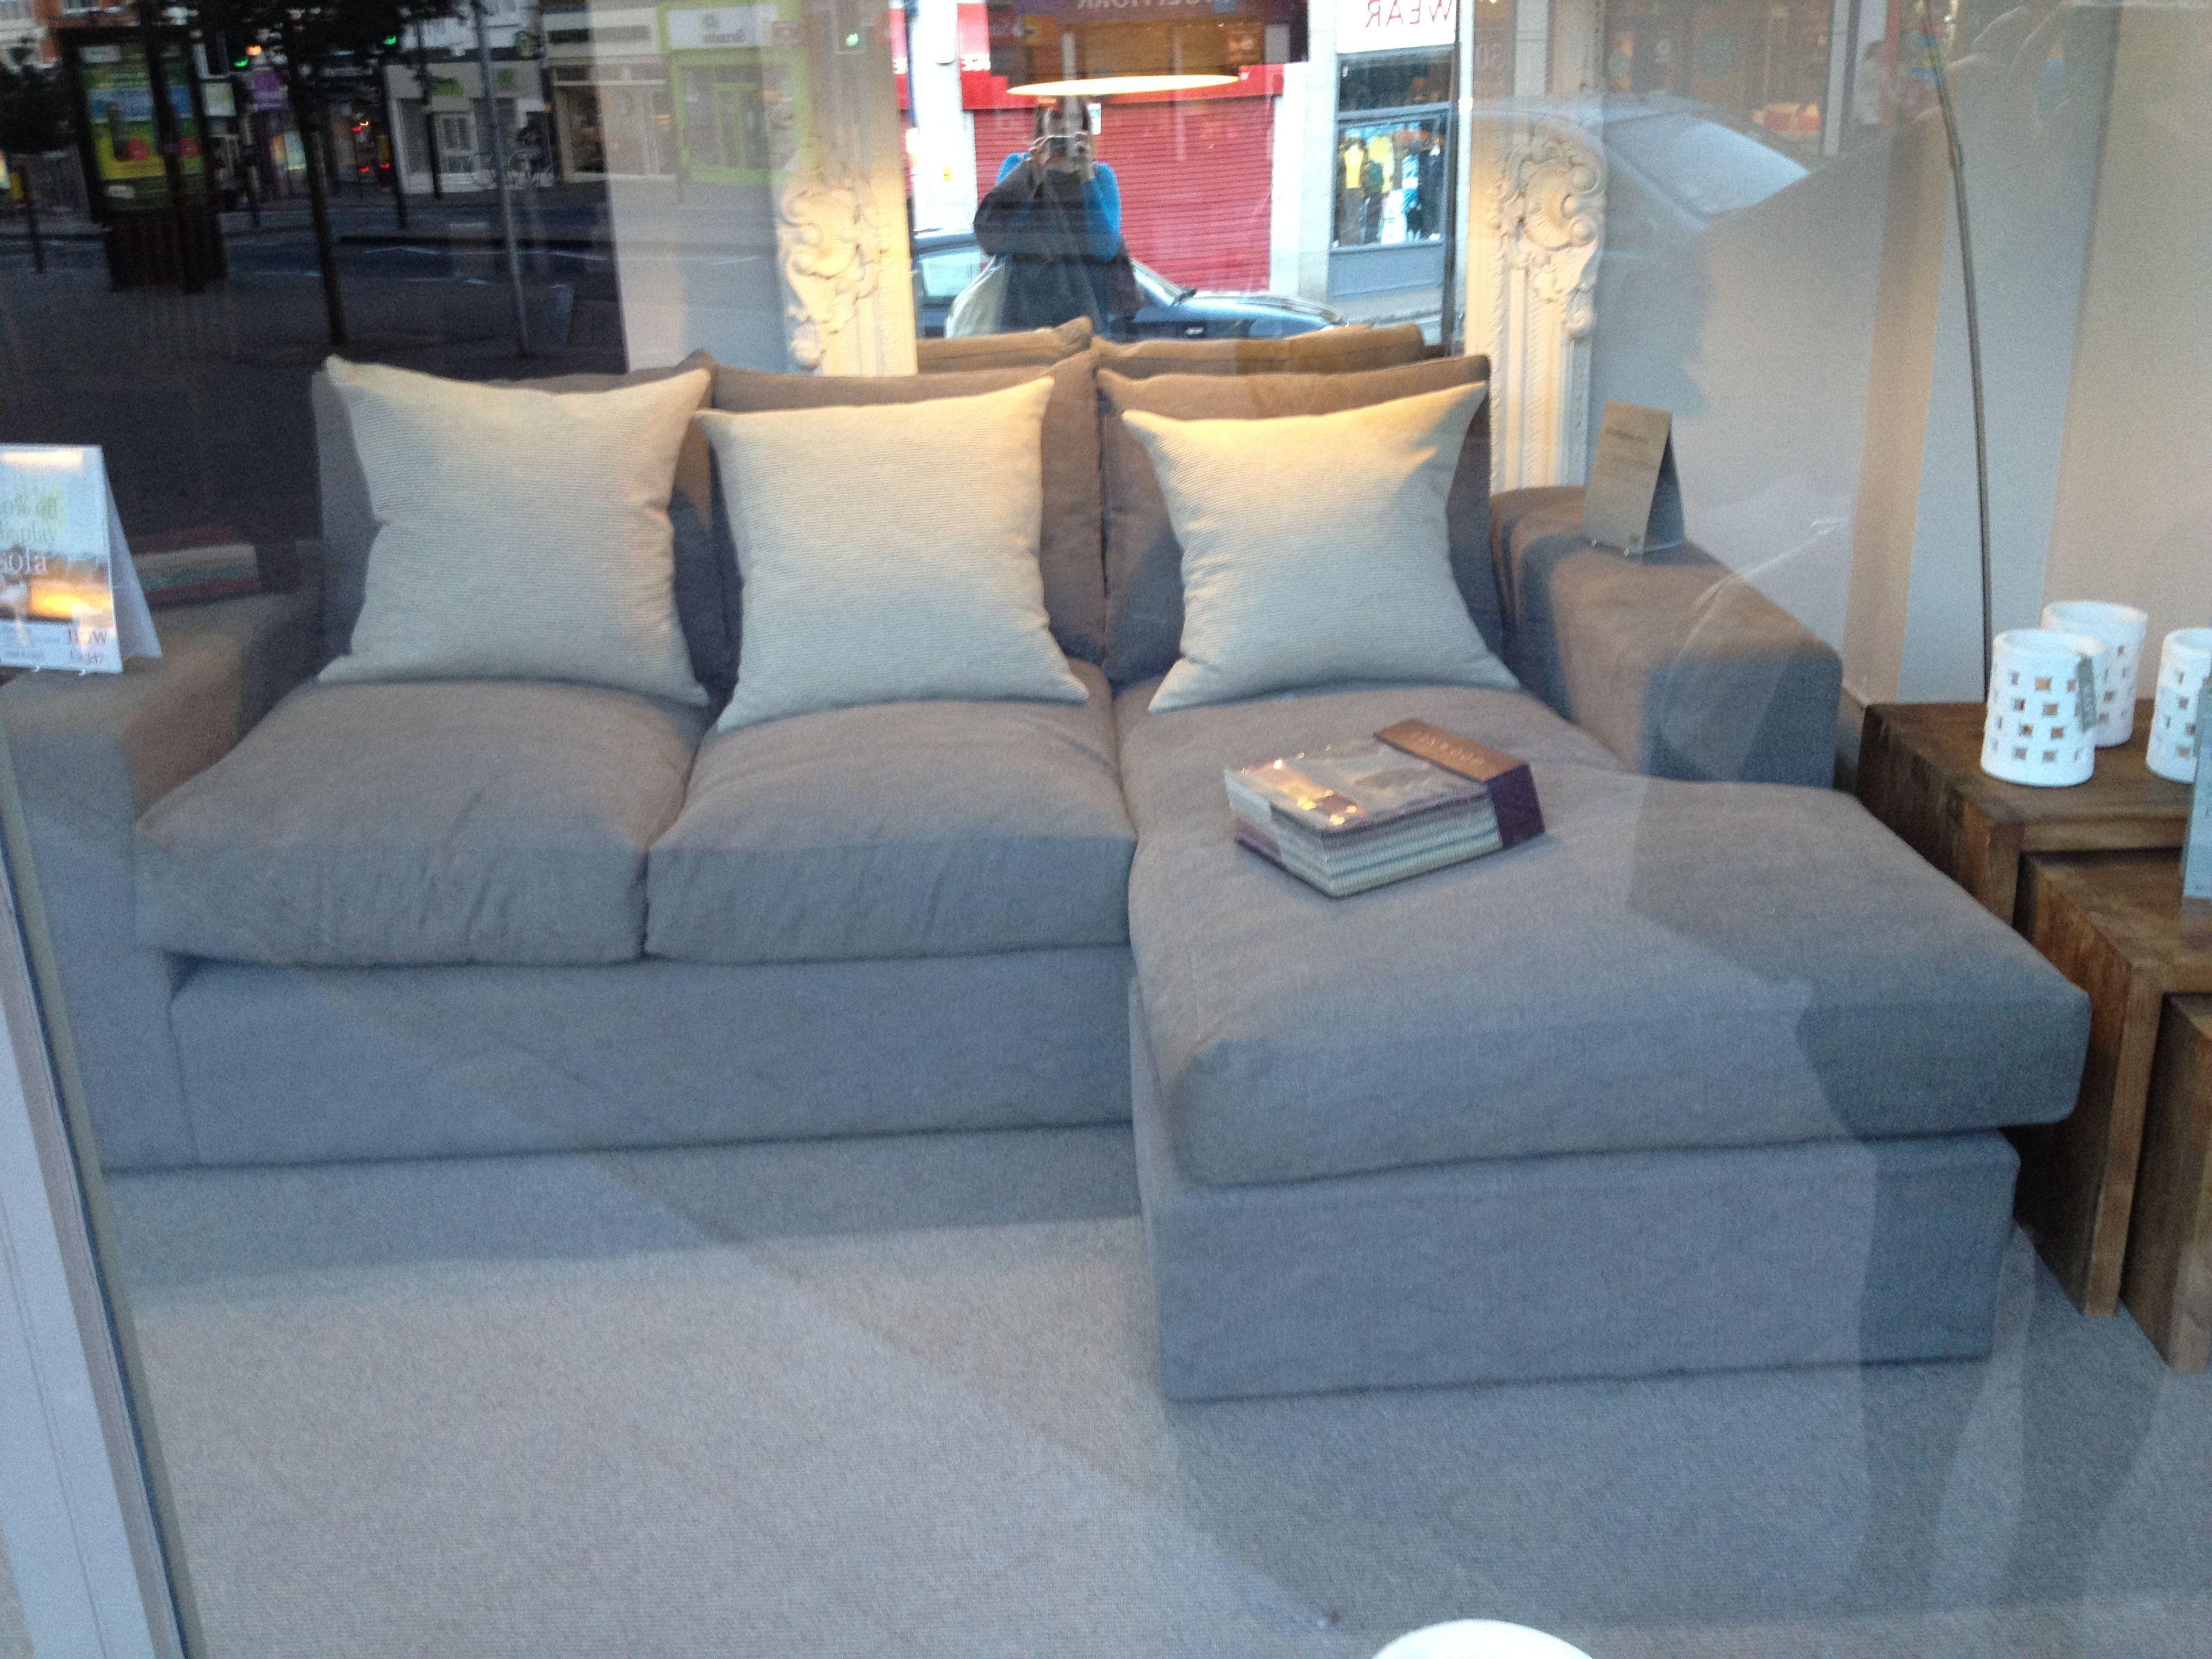 Swell Raft Furniture Manhattan Sofa Home Ideas Sofa Gamerscity Chair Design For Home Gamerscityorg